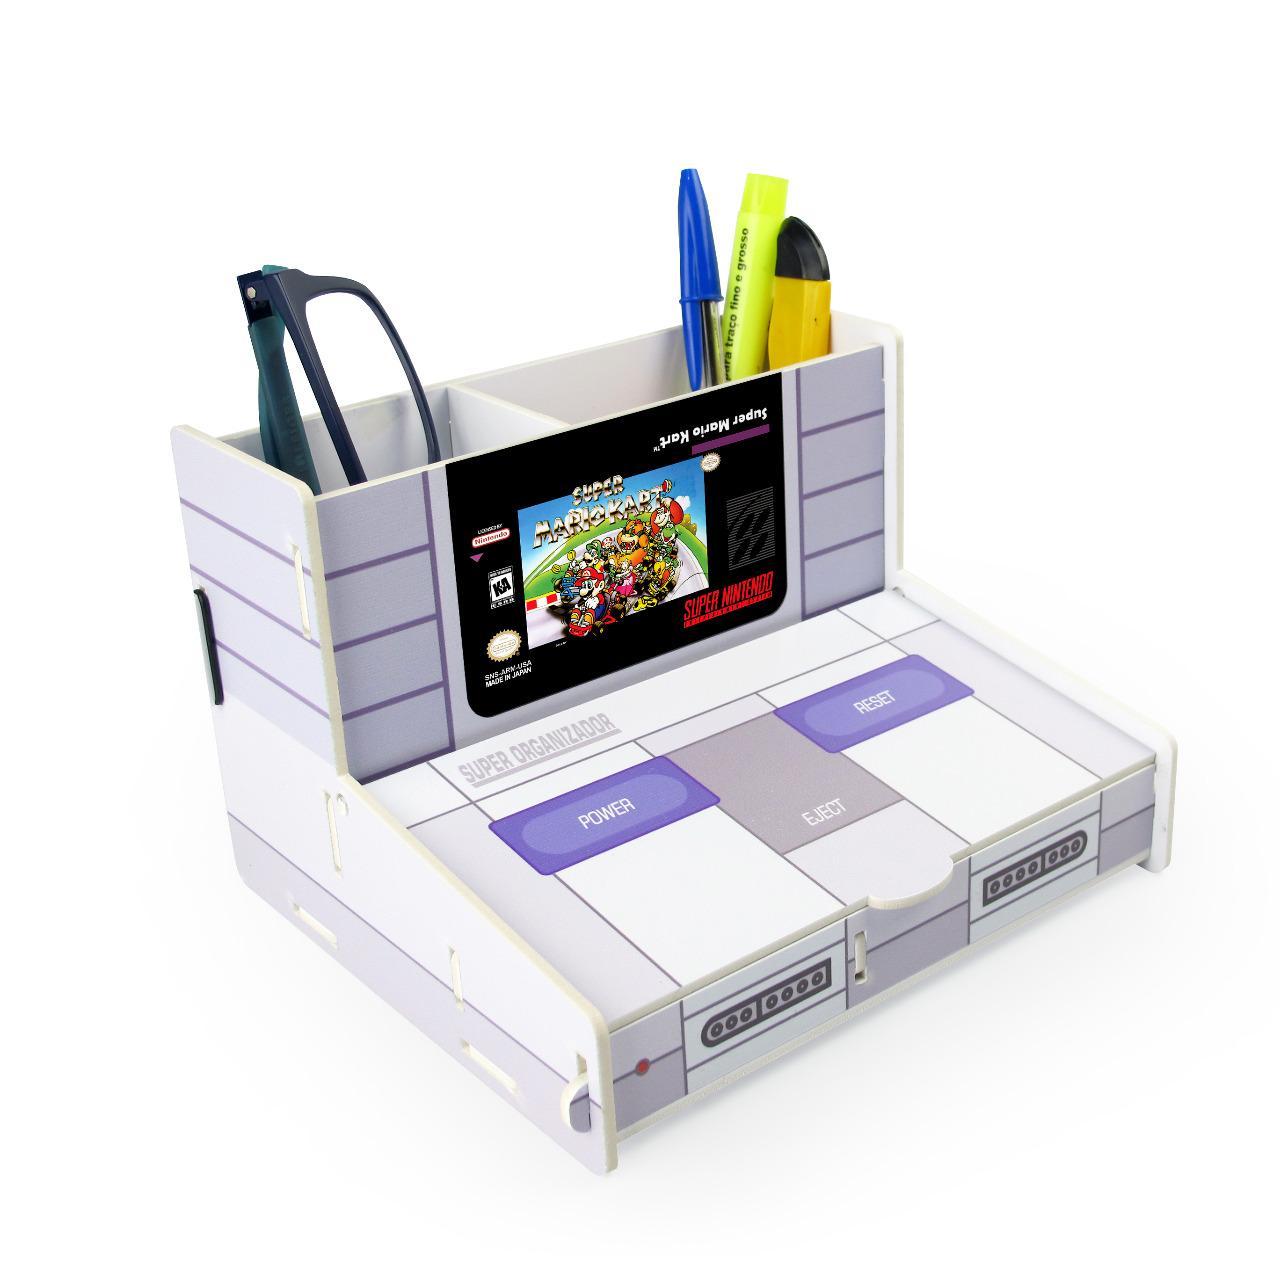 Porta Treco (Organizador de Escritório) Super Mario Kart - Nintendo